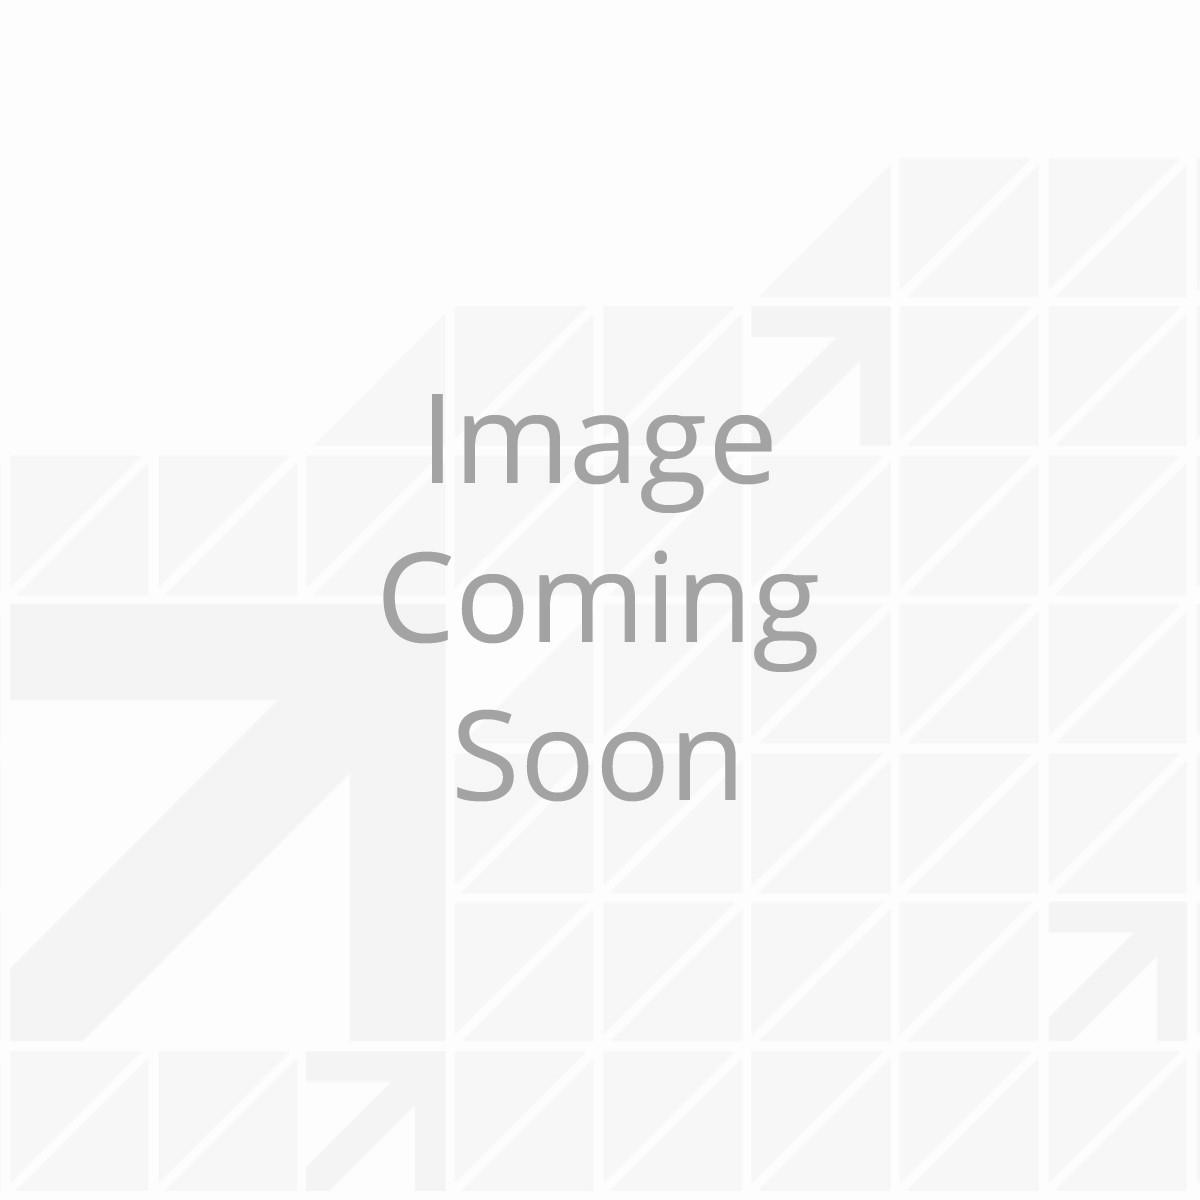 664640_SolidStep_Render